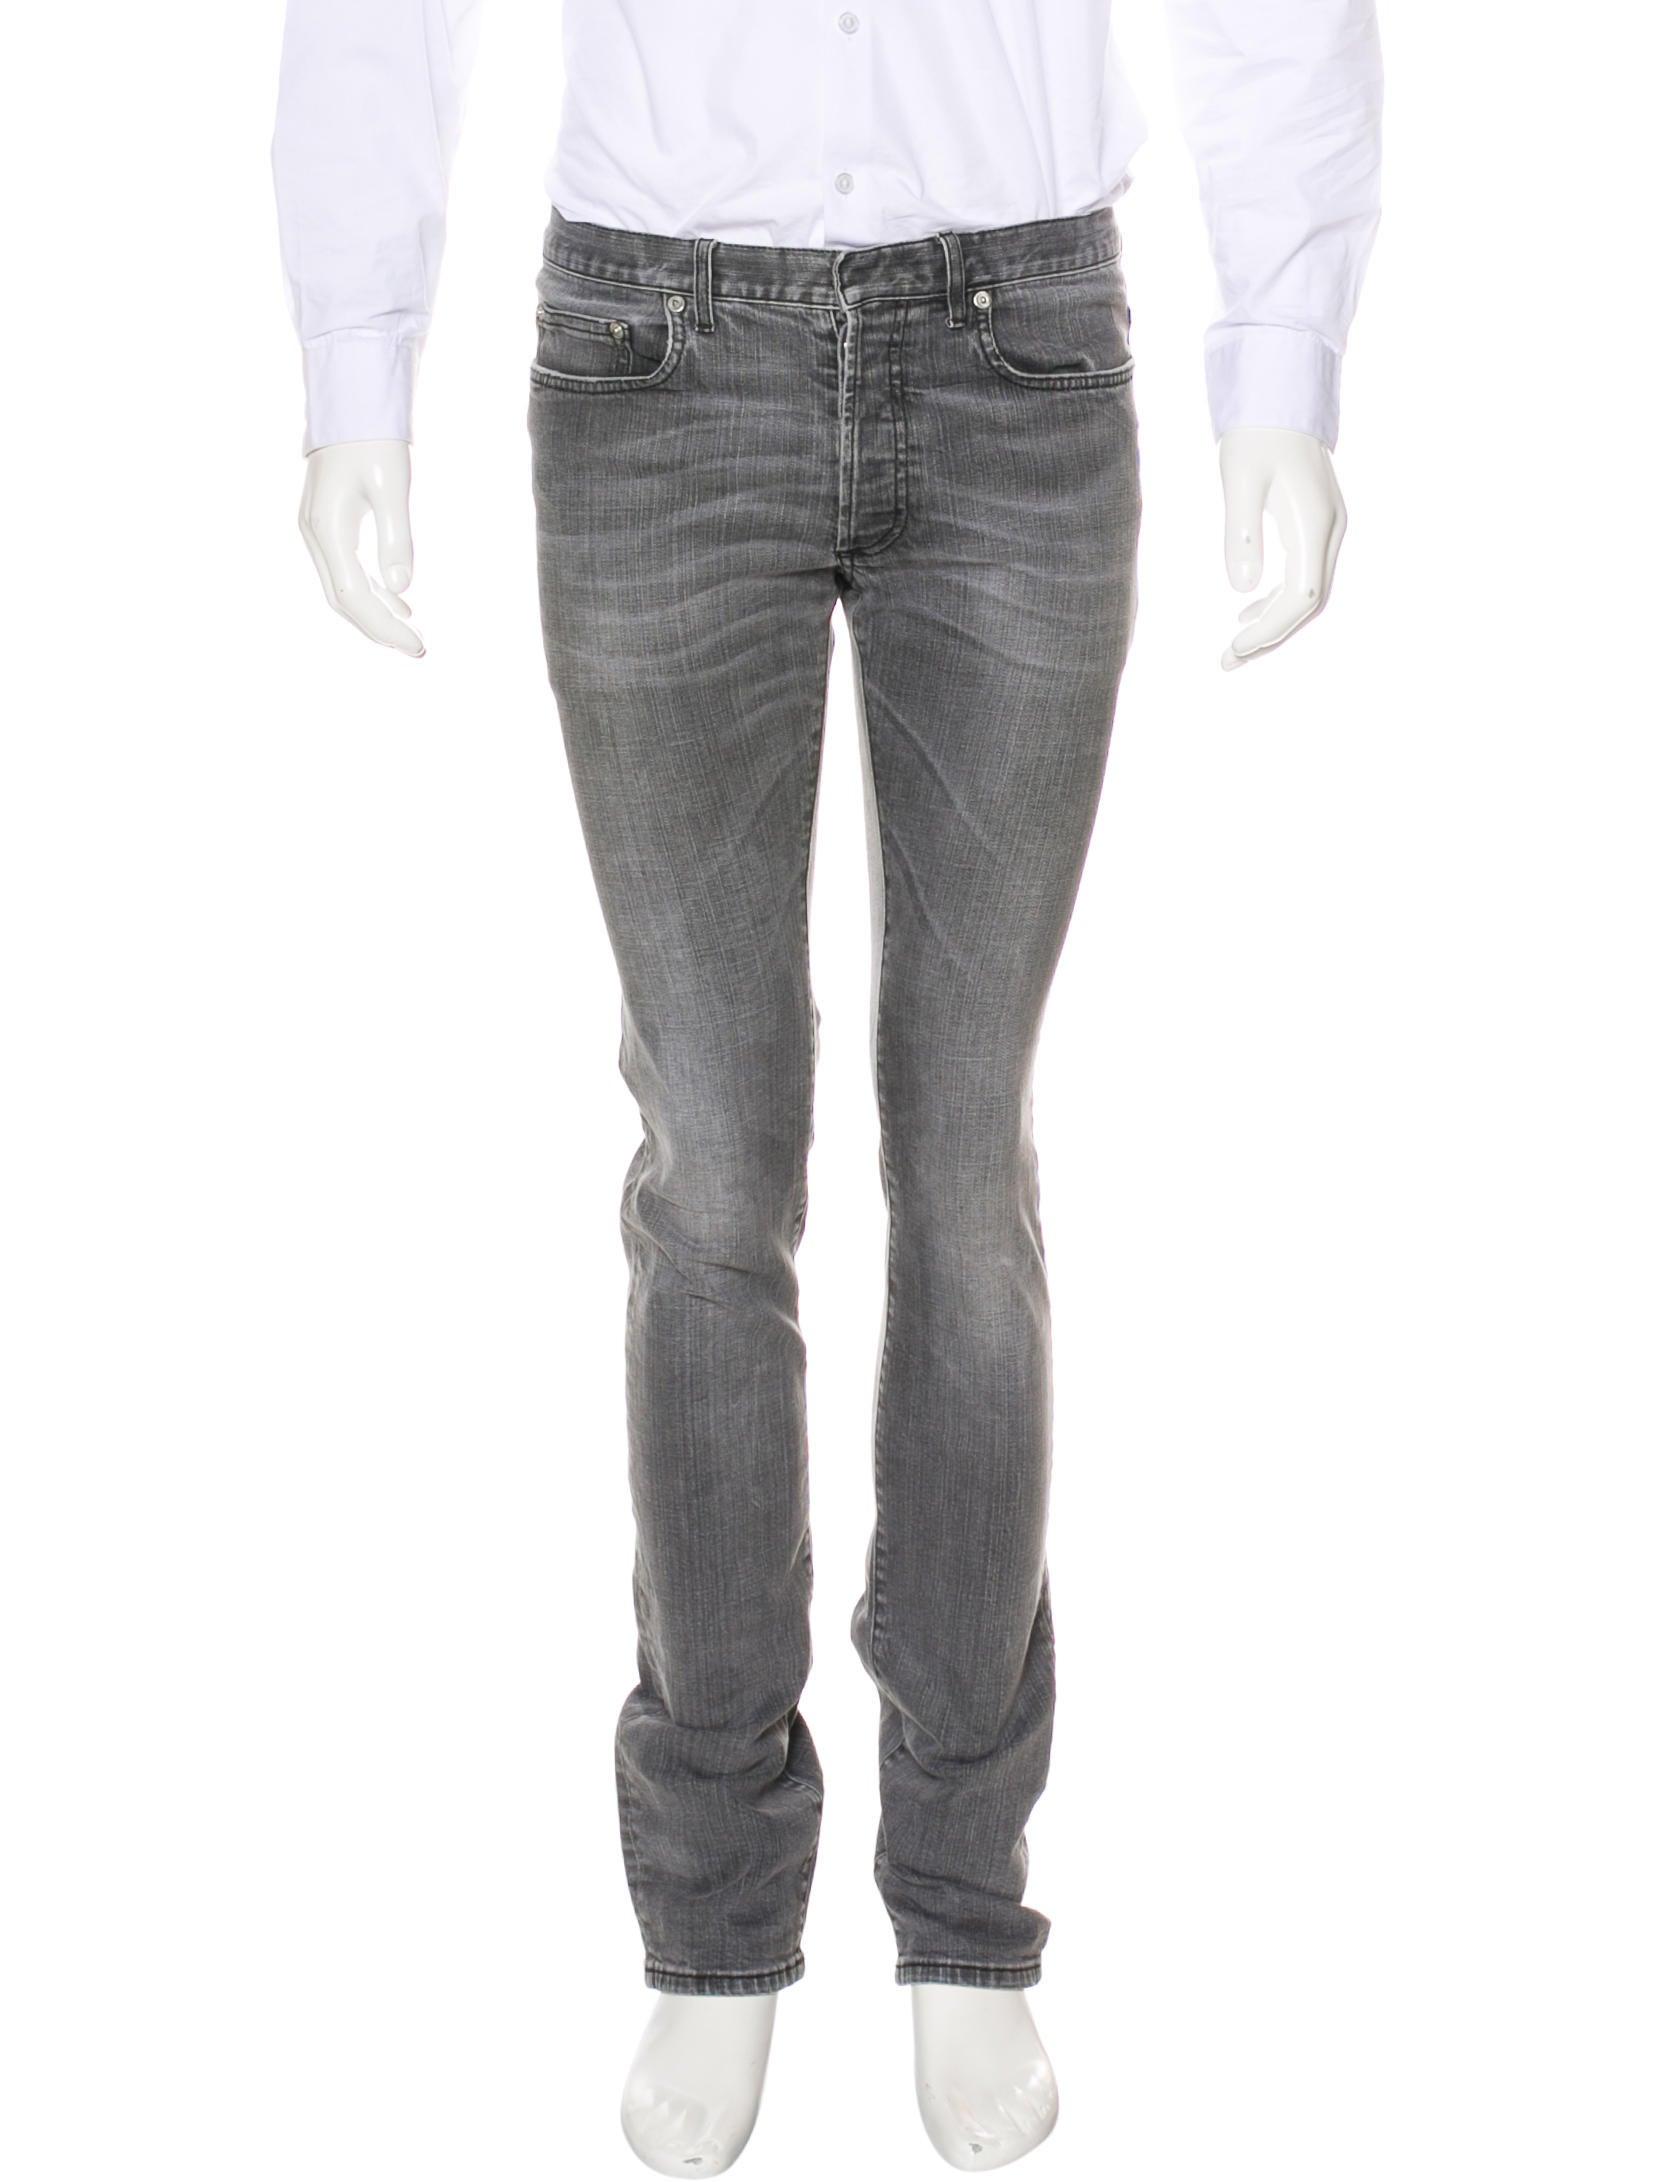 dior homme skinny jeans clothing hmm23736 the realreal. Black Bedroom Furniture Sets. Home Design Ideas